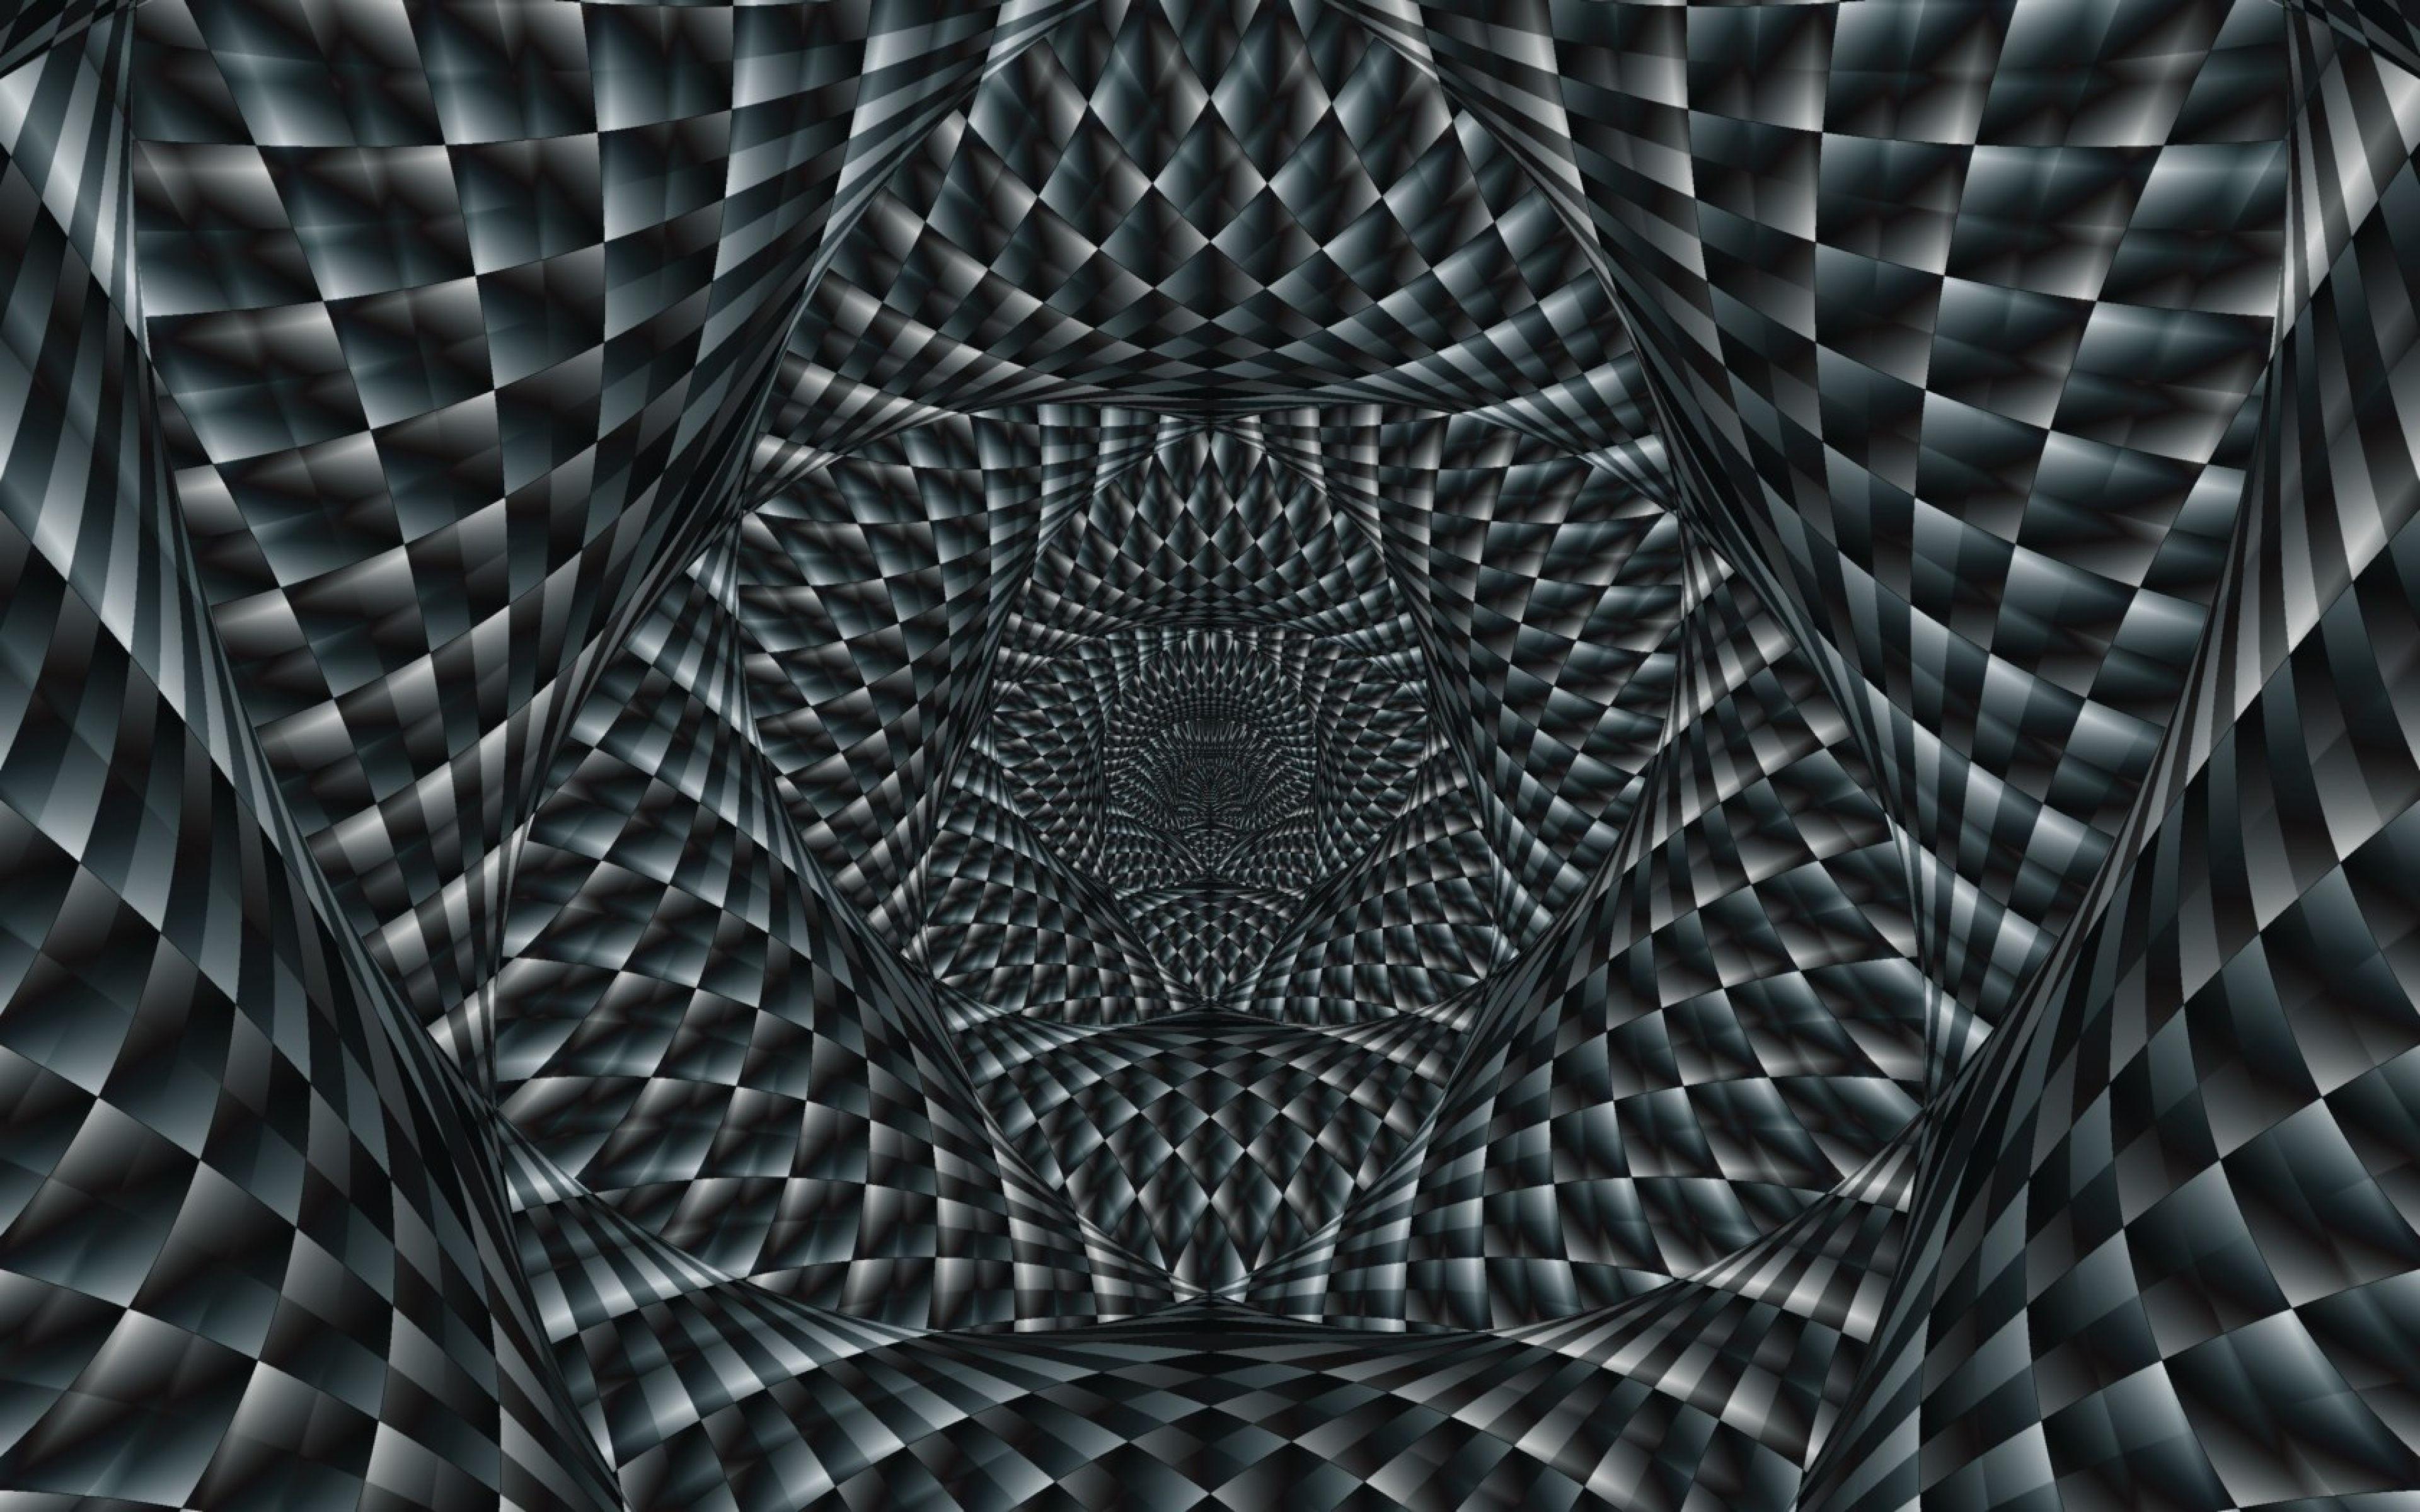 Ultra Hd 4k Optical Illusion Wallpapers Hd Desktop Backgrounds